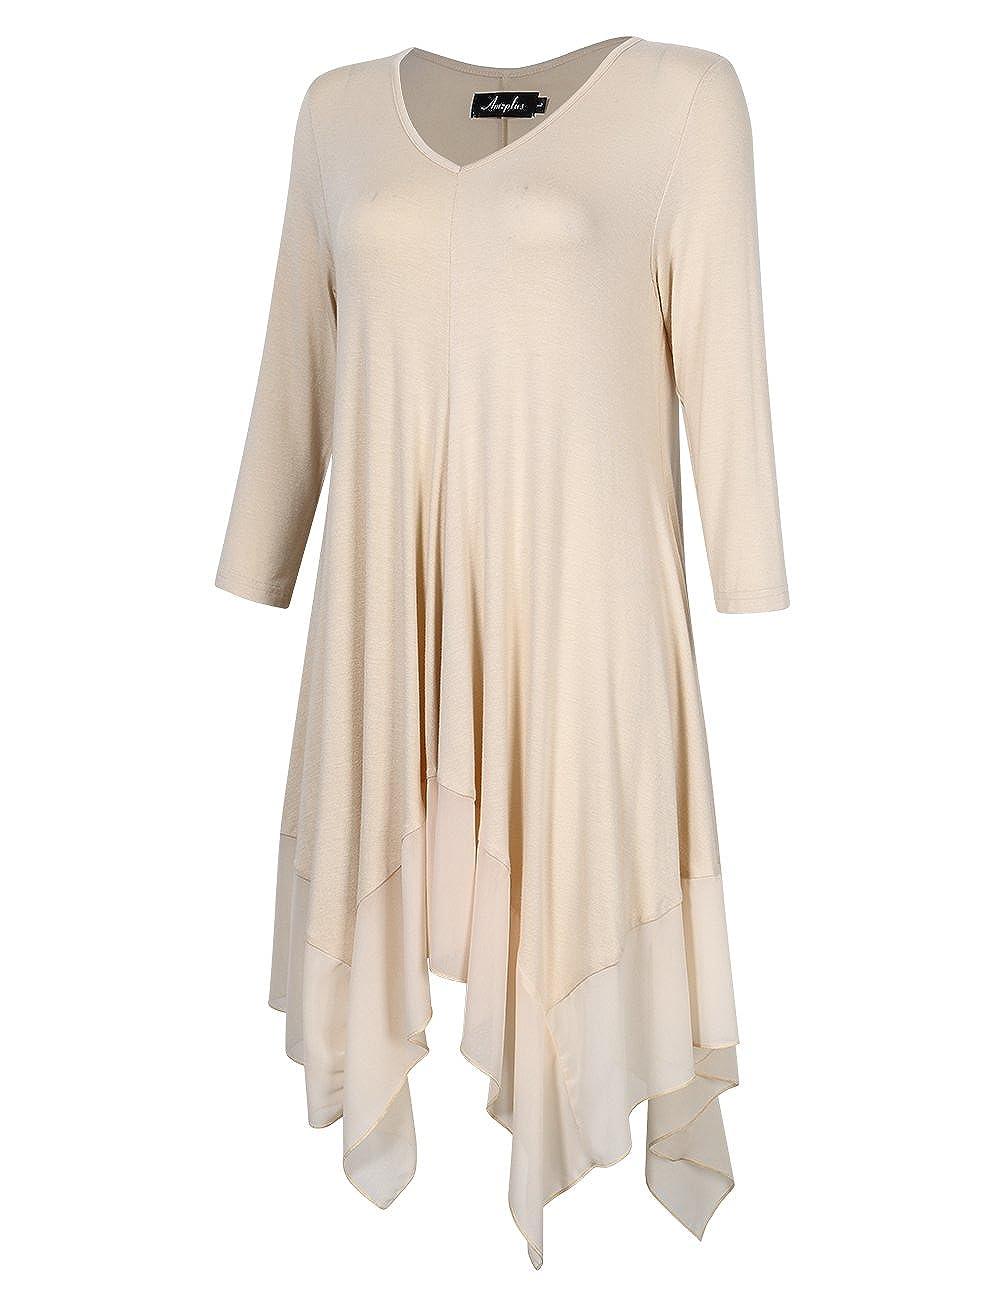 cfab912fff9 AMZ PLUS Womens Plus Size Irregular Hem Short Sleeve Loose Shirt Dress Top  at Amazon Women s Clothing store